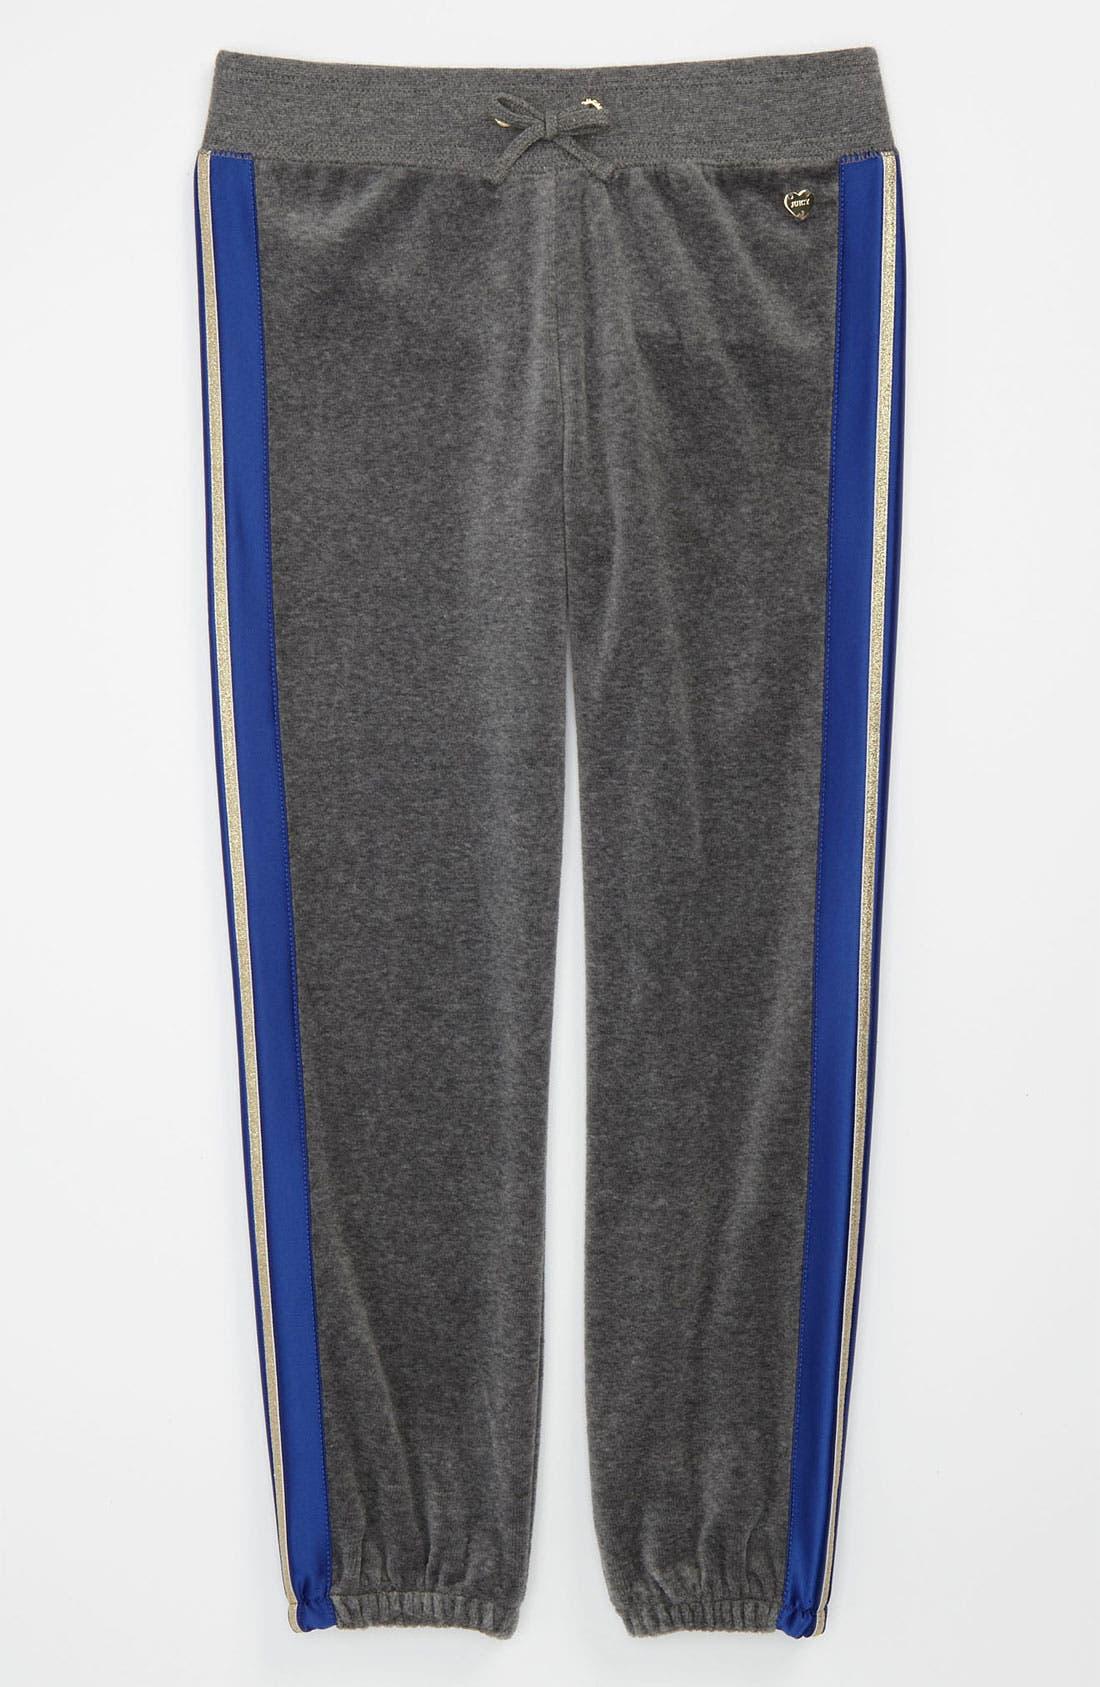 Alternate Image 1 Selected - Juicy Couture Metallic Stripe Pants (Little Girls & Big Girls)